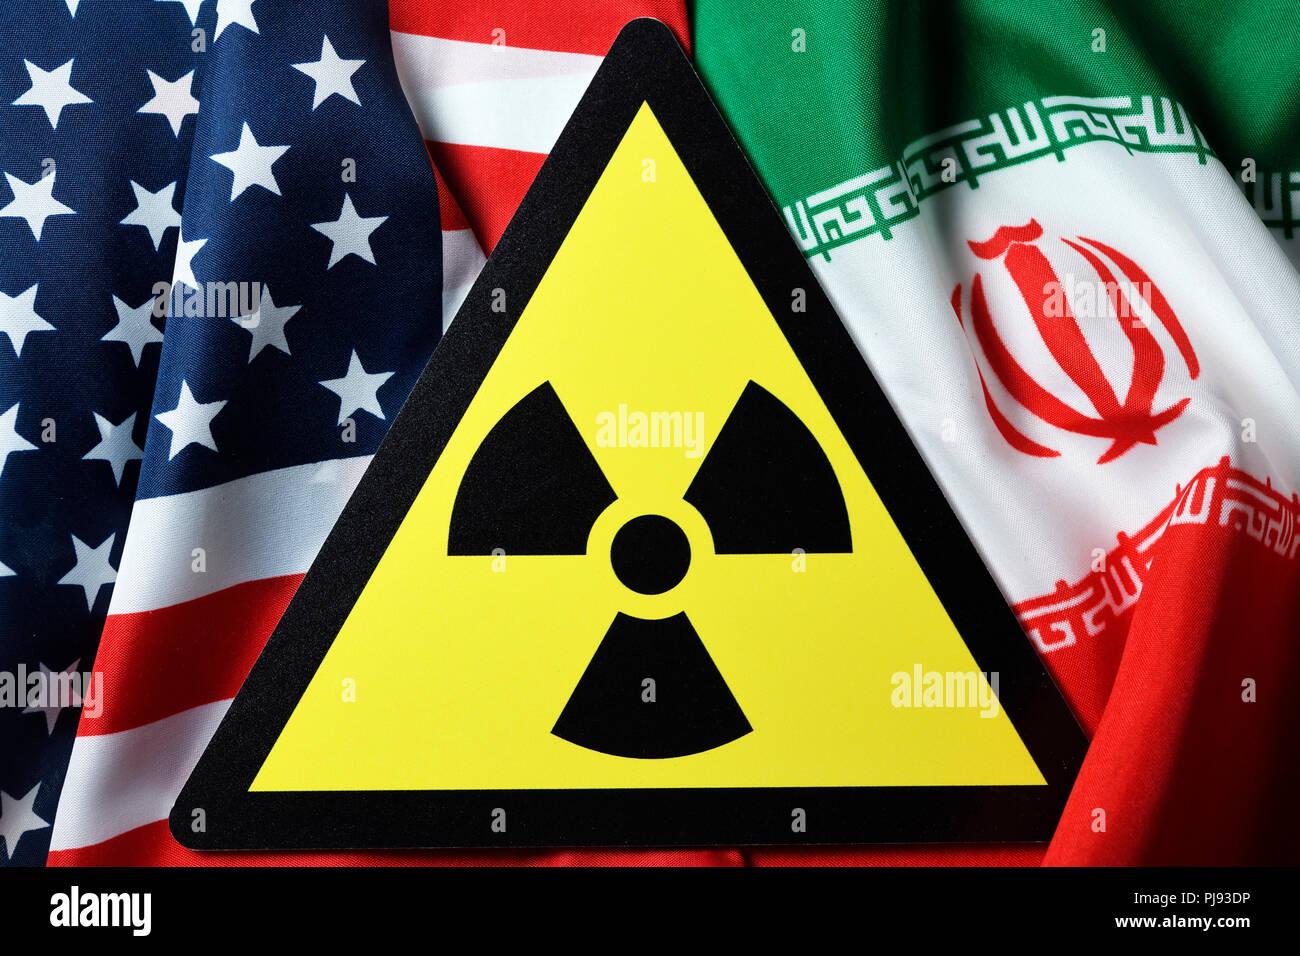 Flags of the USA and Iran and radioactivity warning, Iranian nuclear agreement, Fahnen von USA und Iran und Radioaktivität-Warnschild, iranisches Atom Stock Photo